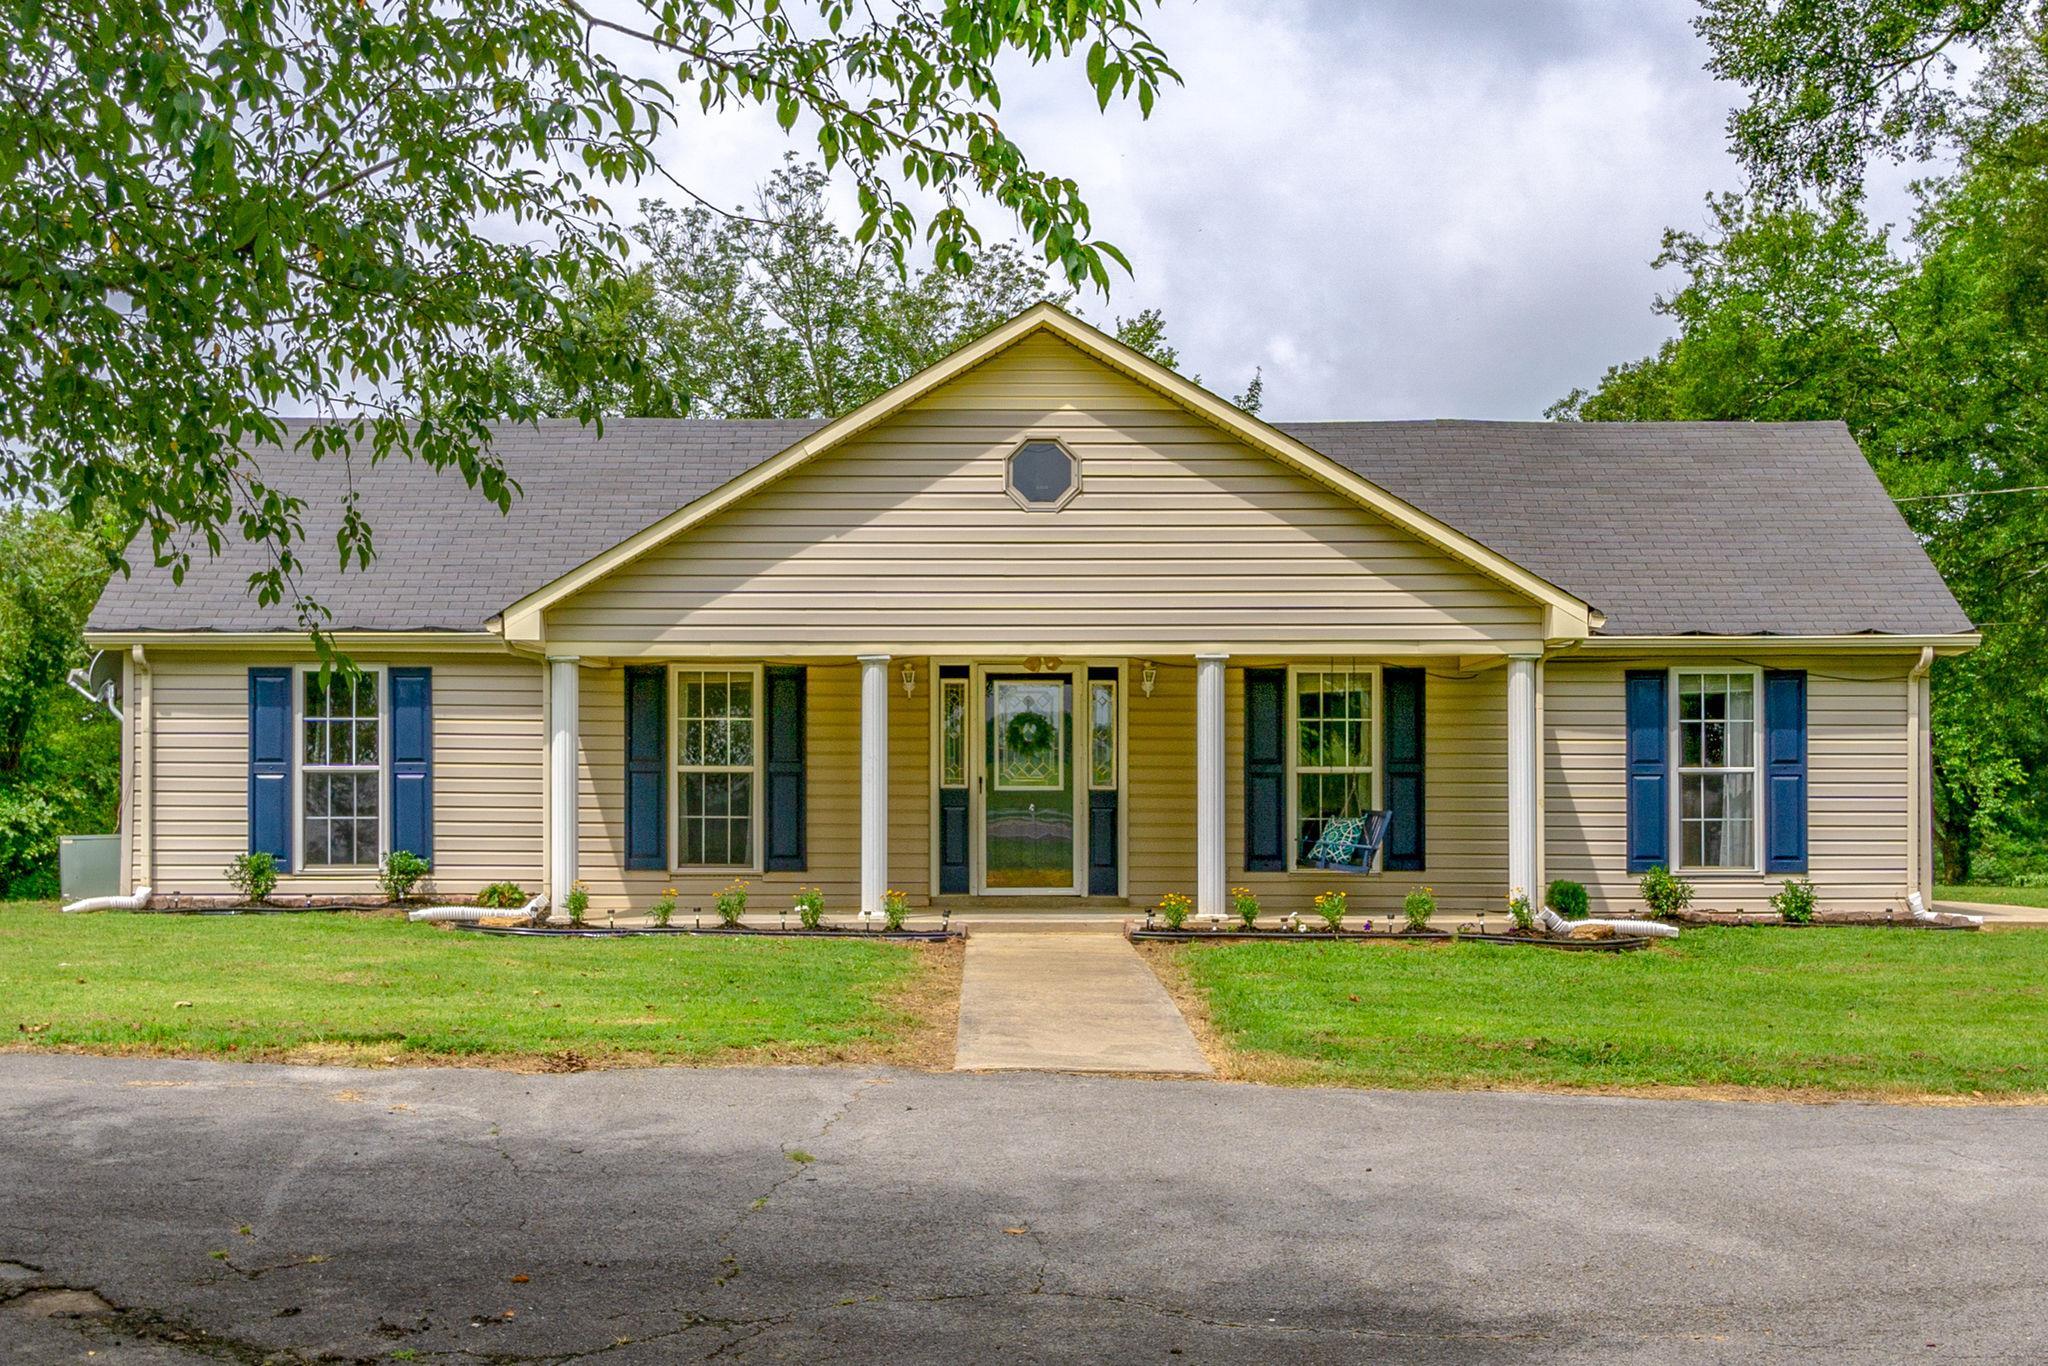 3785 Hwy 41 A N, Unionville, TN 37180 - Unionville, TN real estate listing